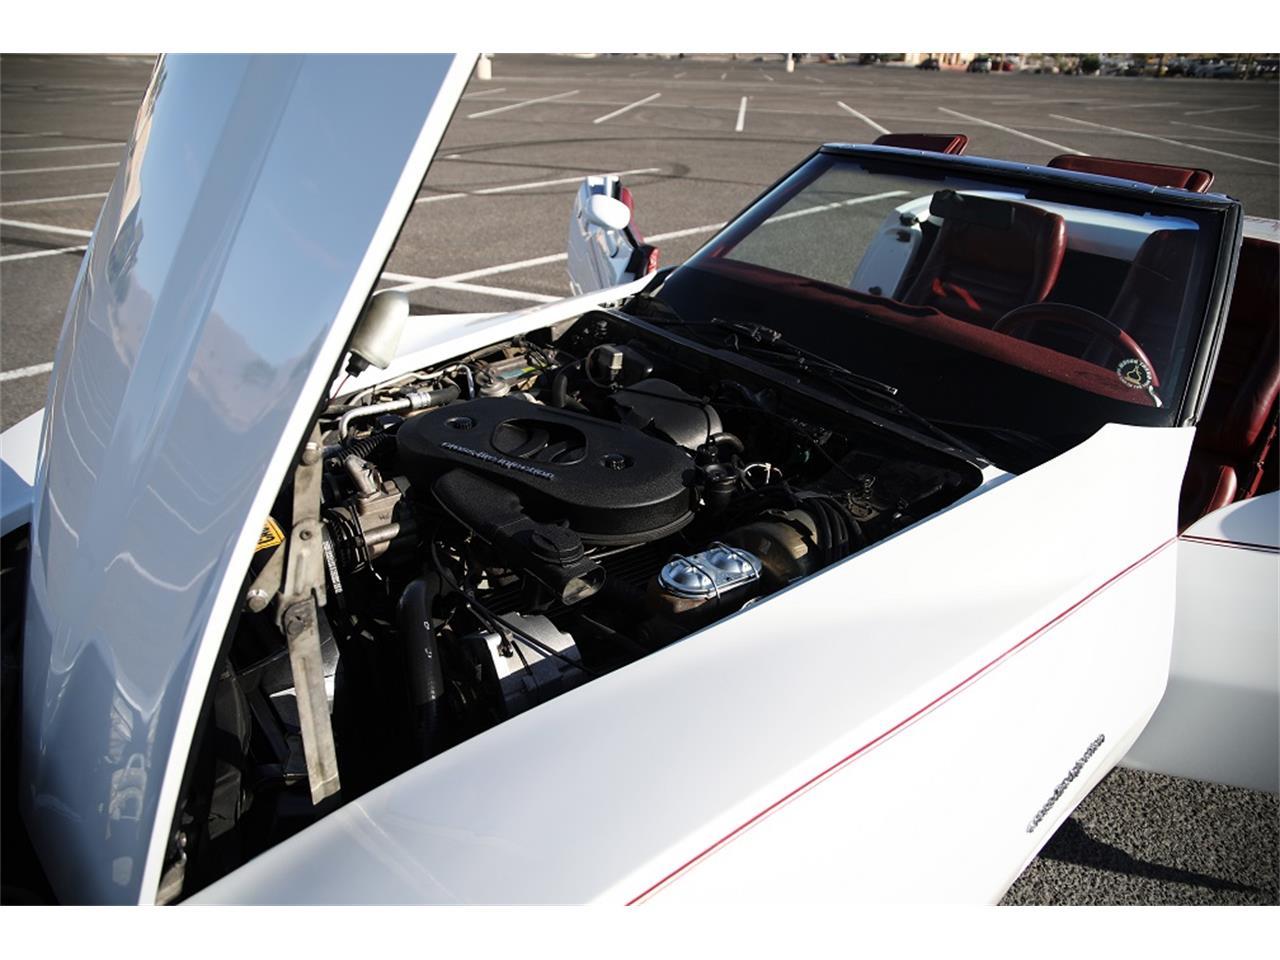 1982 Chevrolet Corvette (CC-1265520) for sale in Lake Havasu City, Arizona